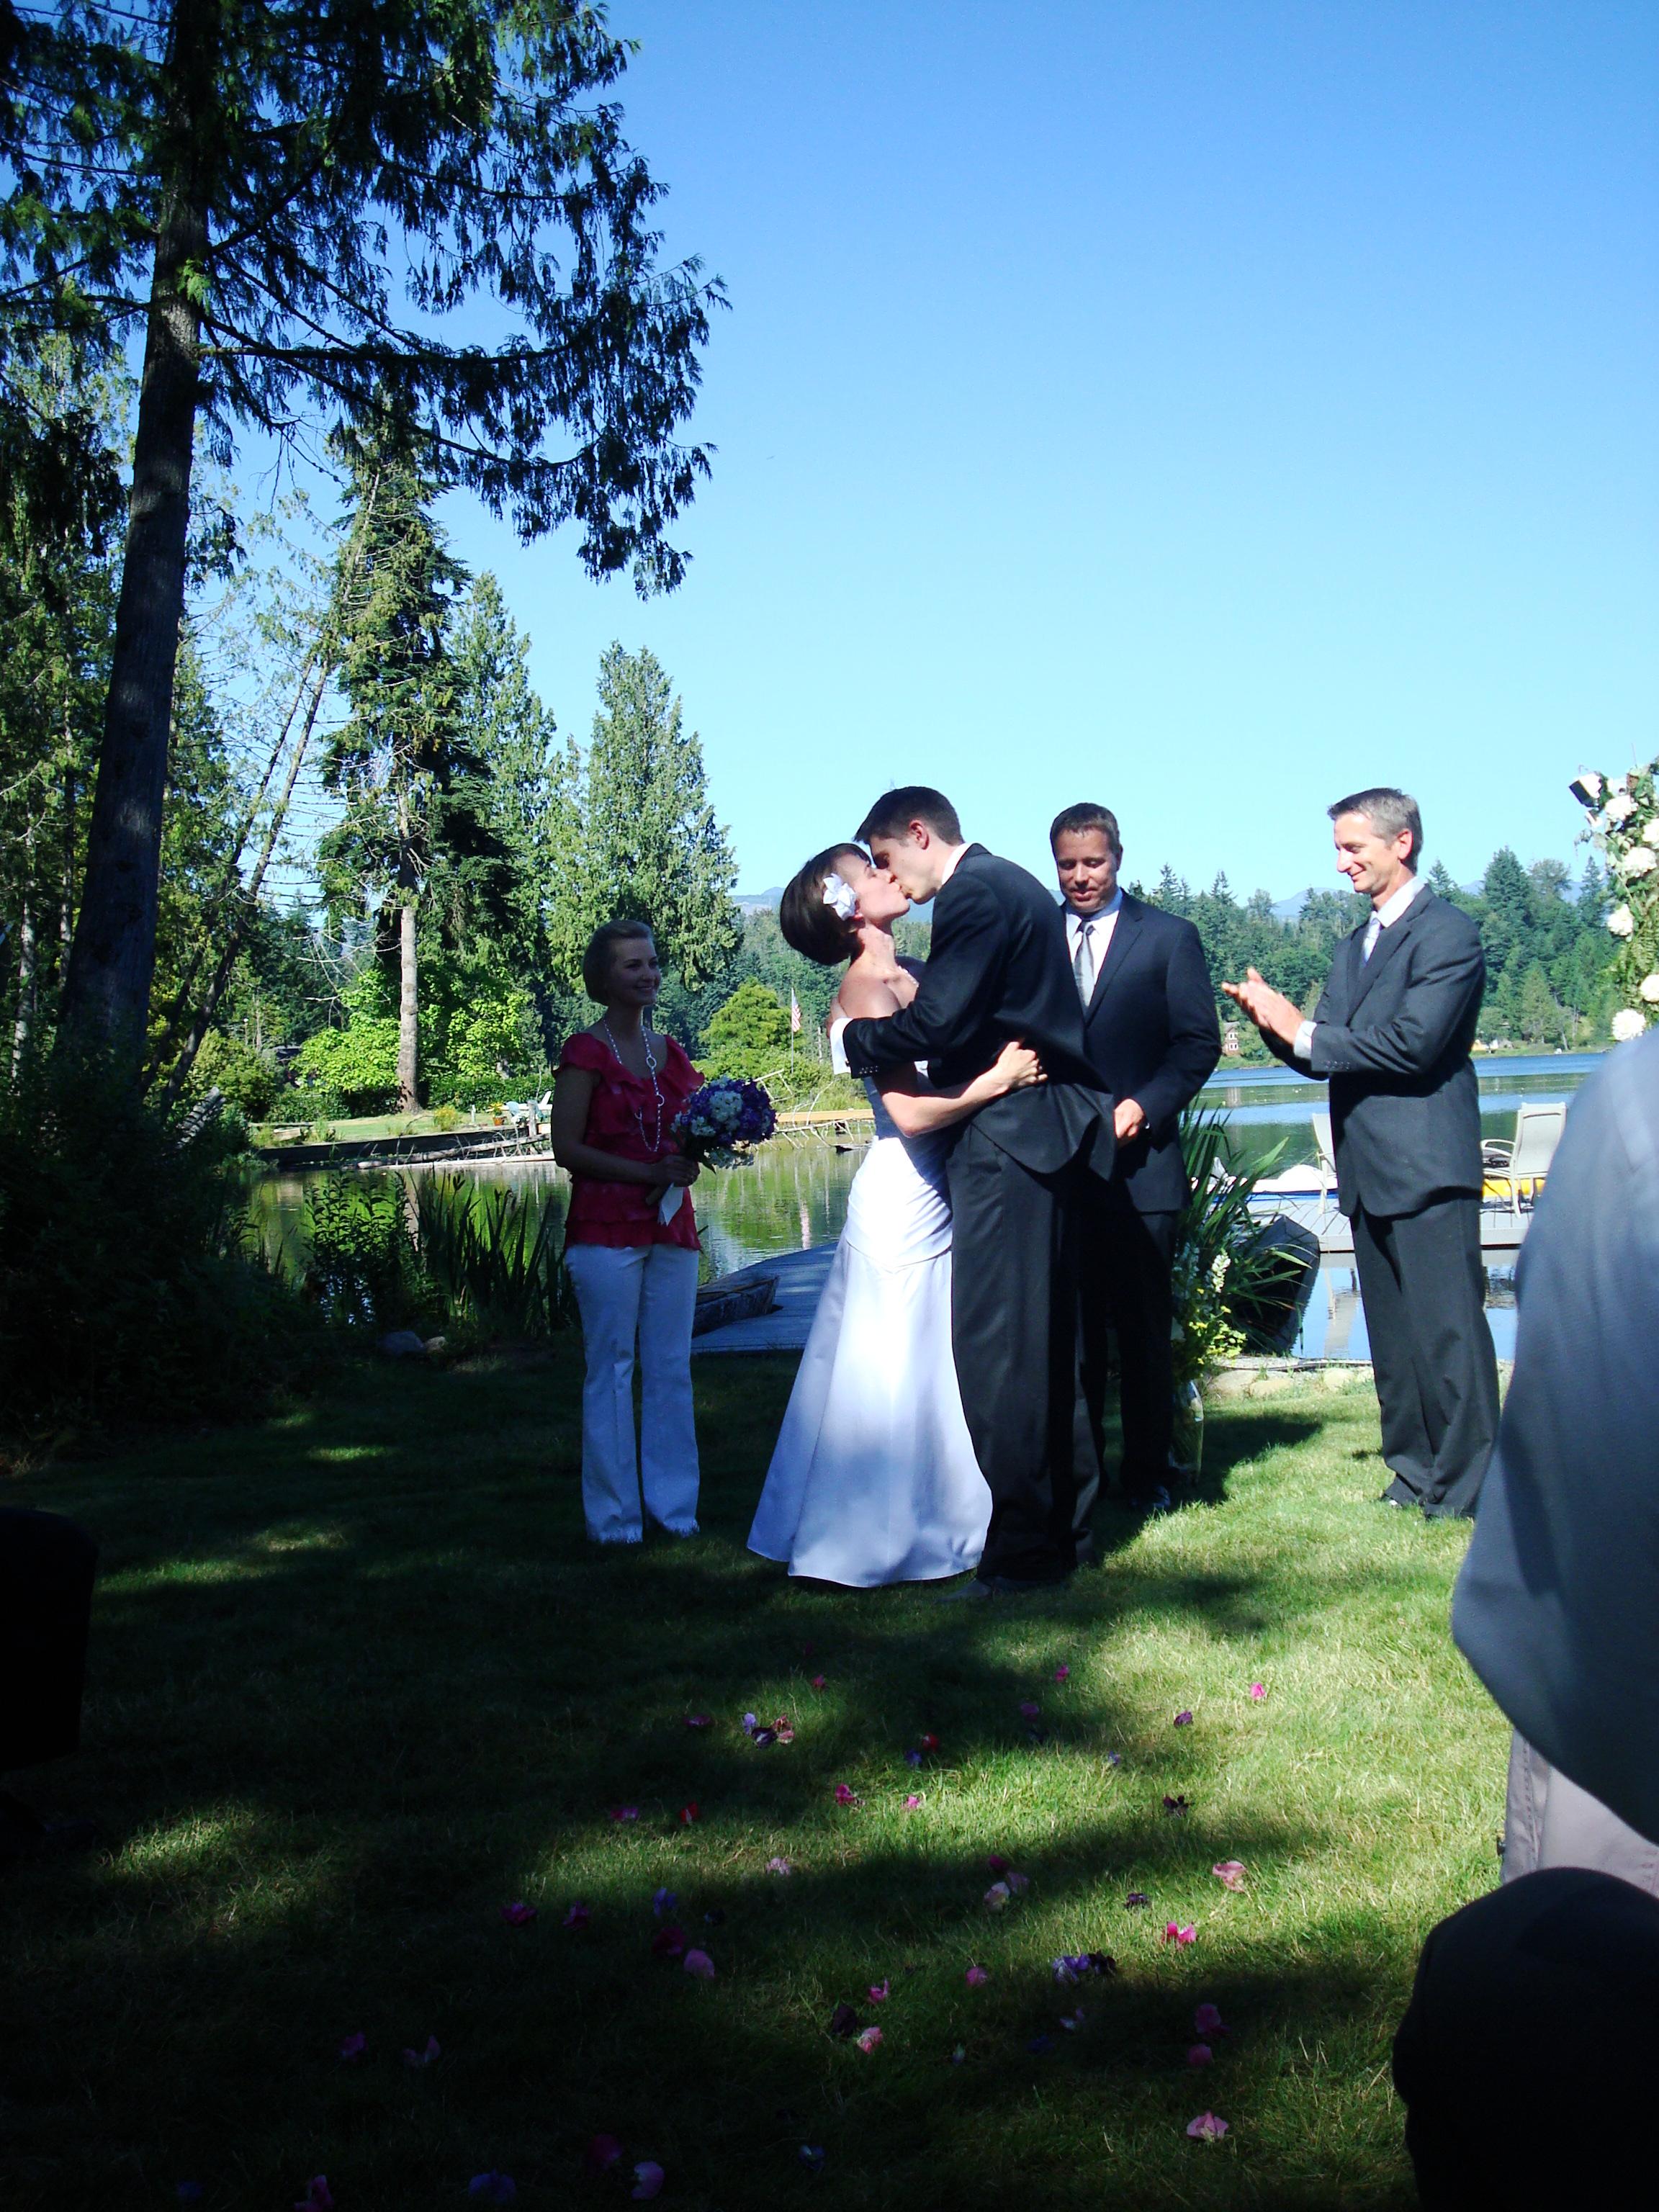 Kristian and Greta